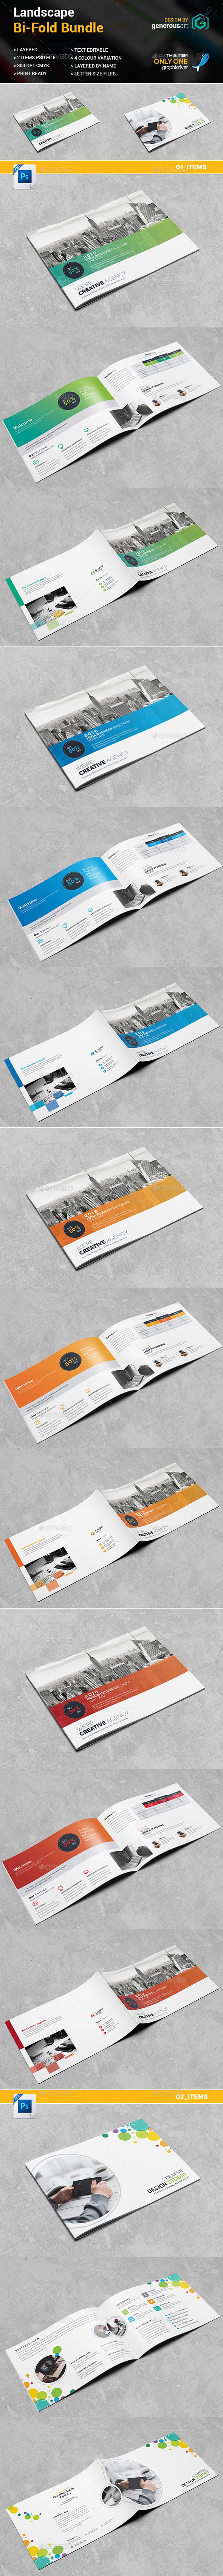 Landscape Bi-Fold Brochure Bundle_2 in 1 - Corporate Brochures